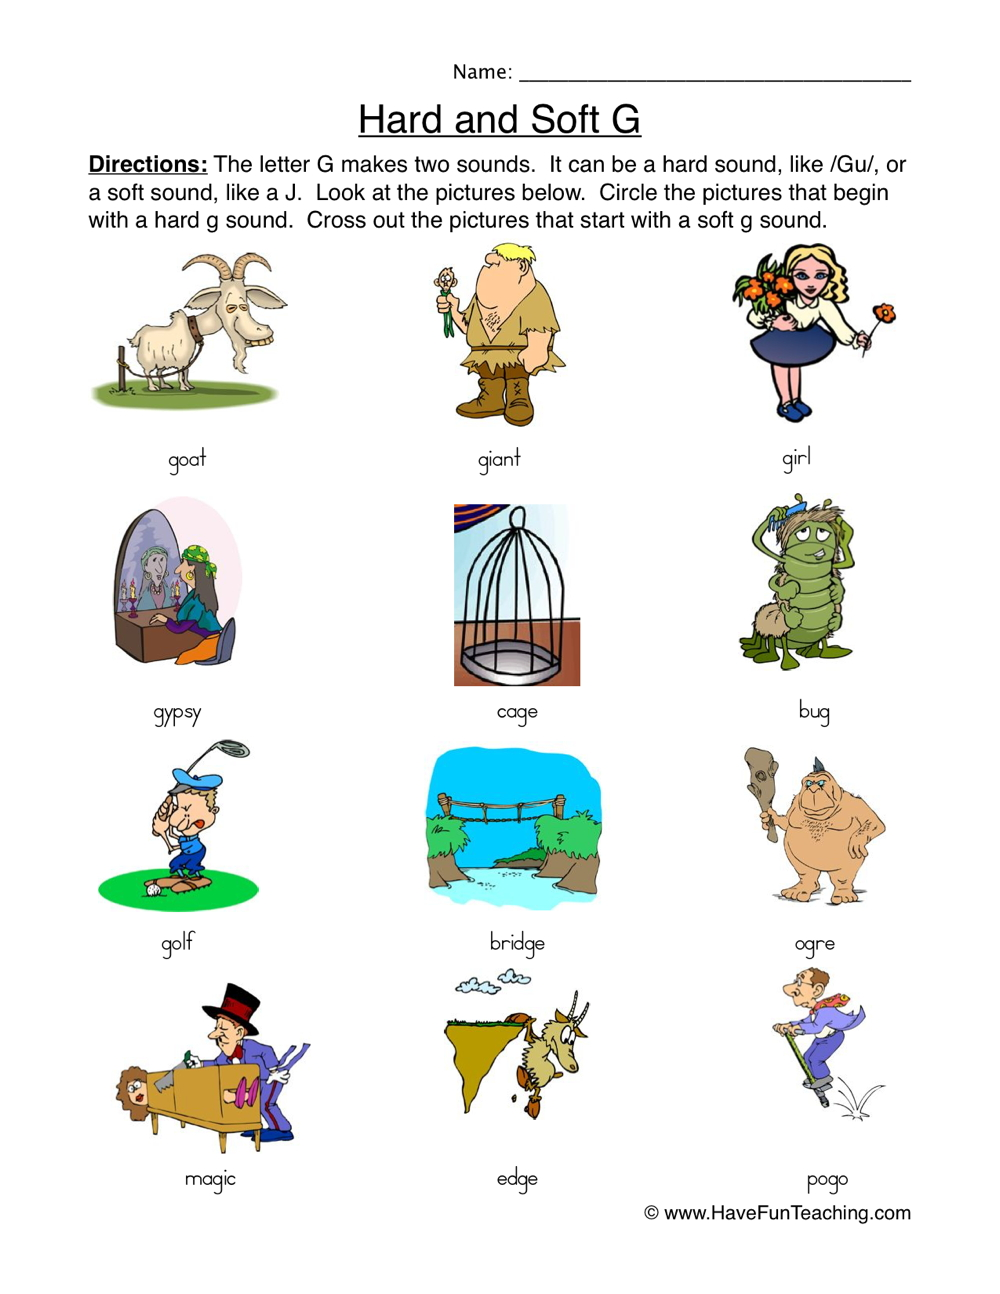 Hard Soft G Worksheet - Pictures | Have Fun Teaching